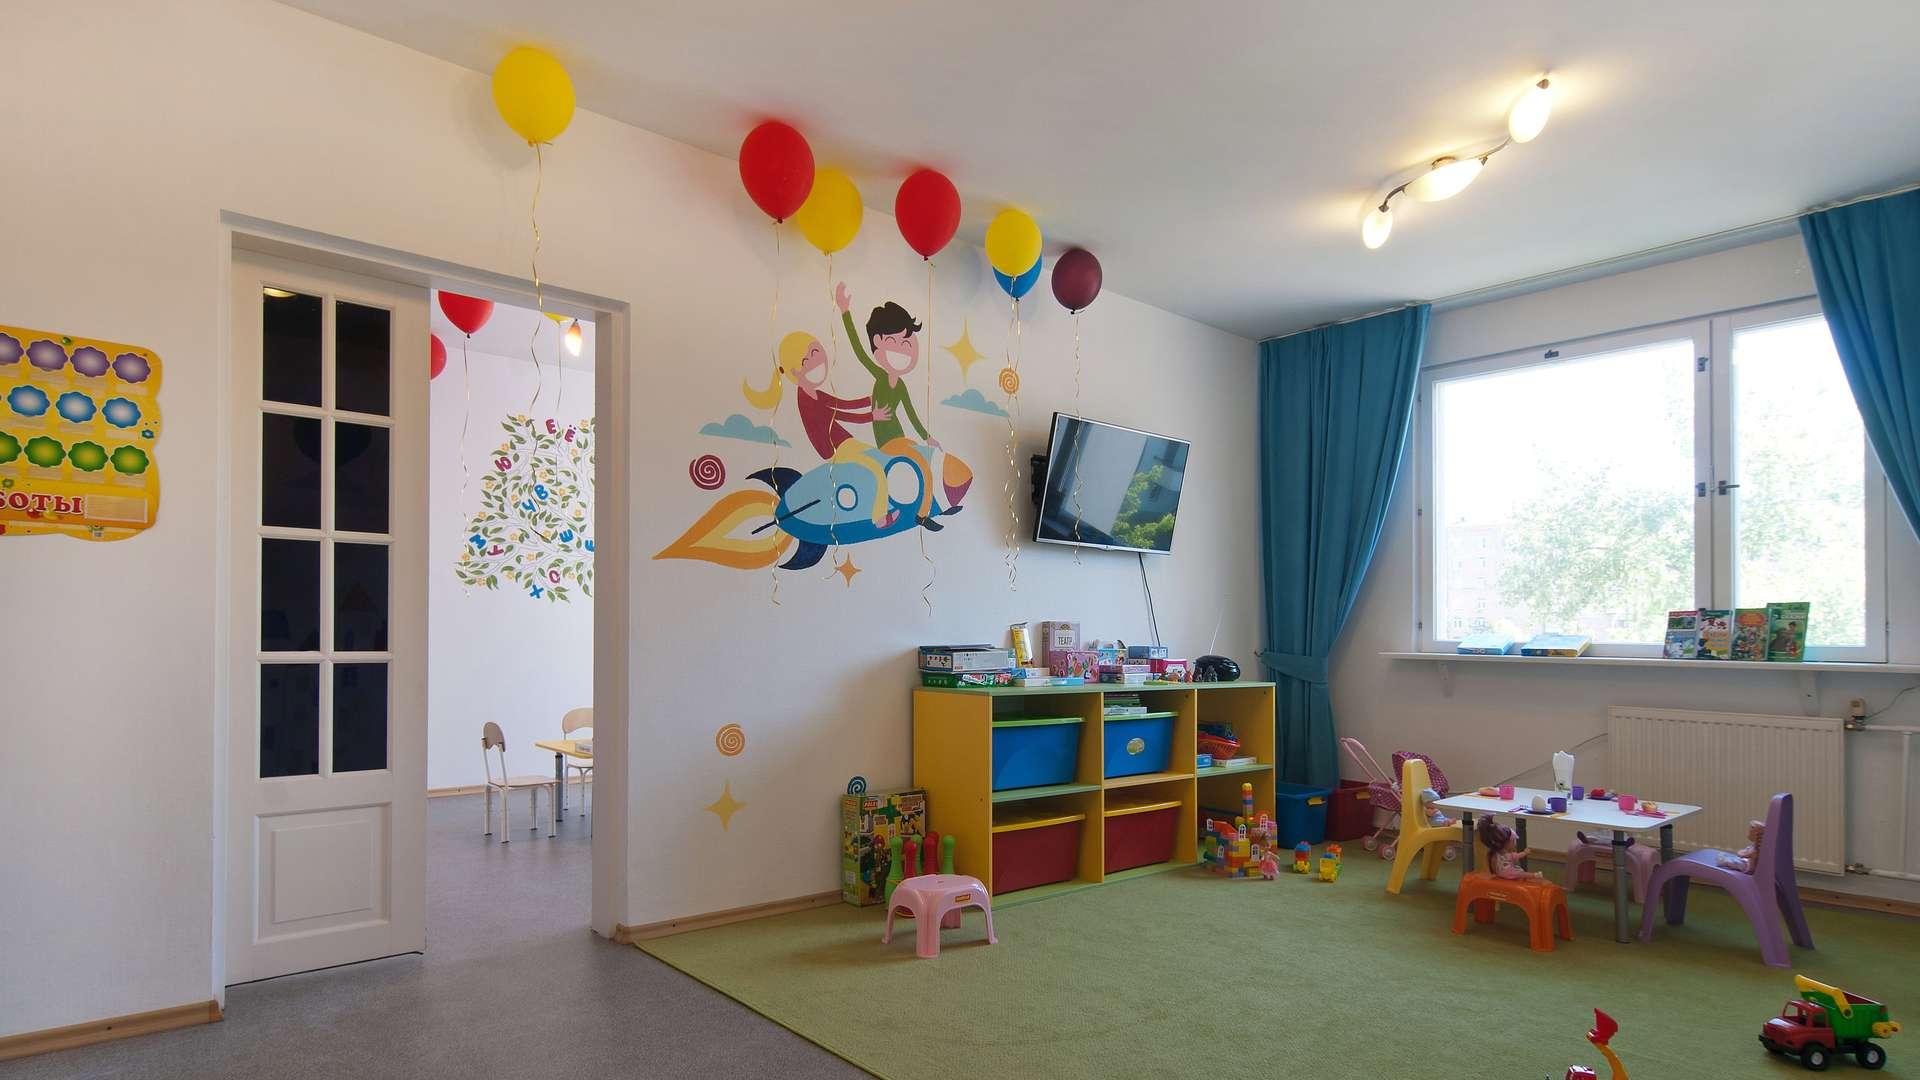 Детские сады королева, частные детские сады королев, очередь в детские сады королева, отзывы о детских садах королева.